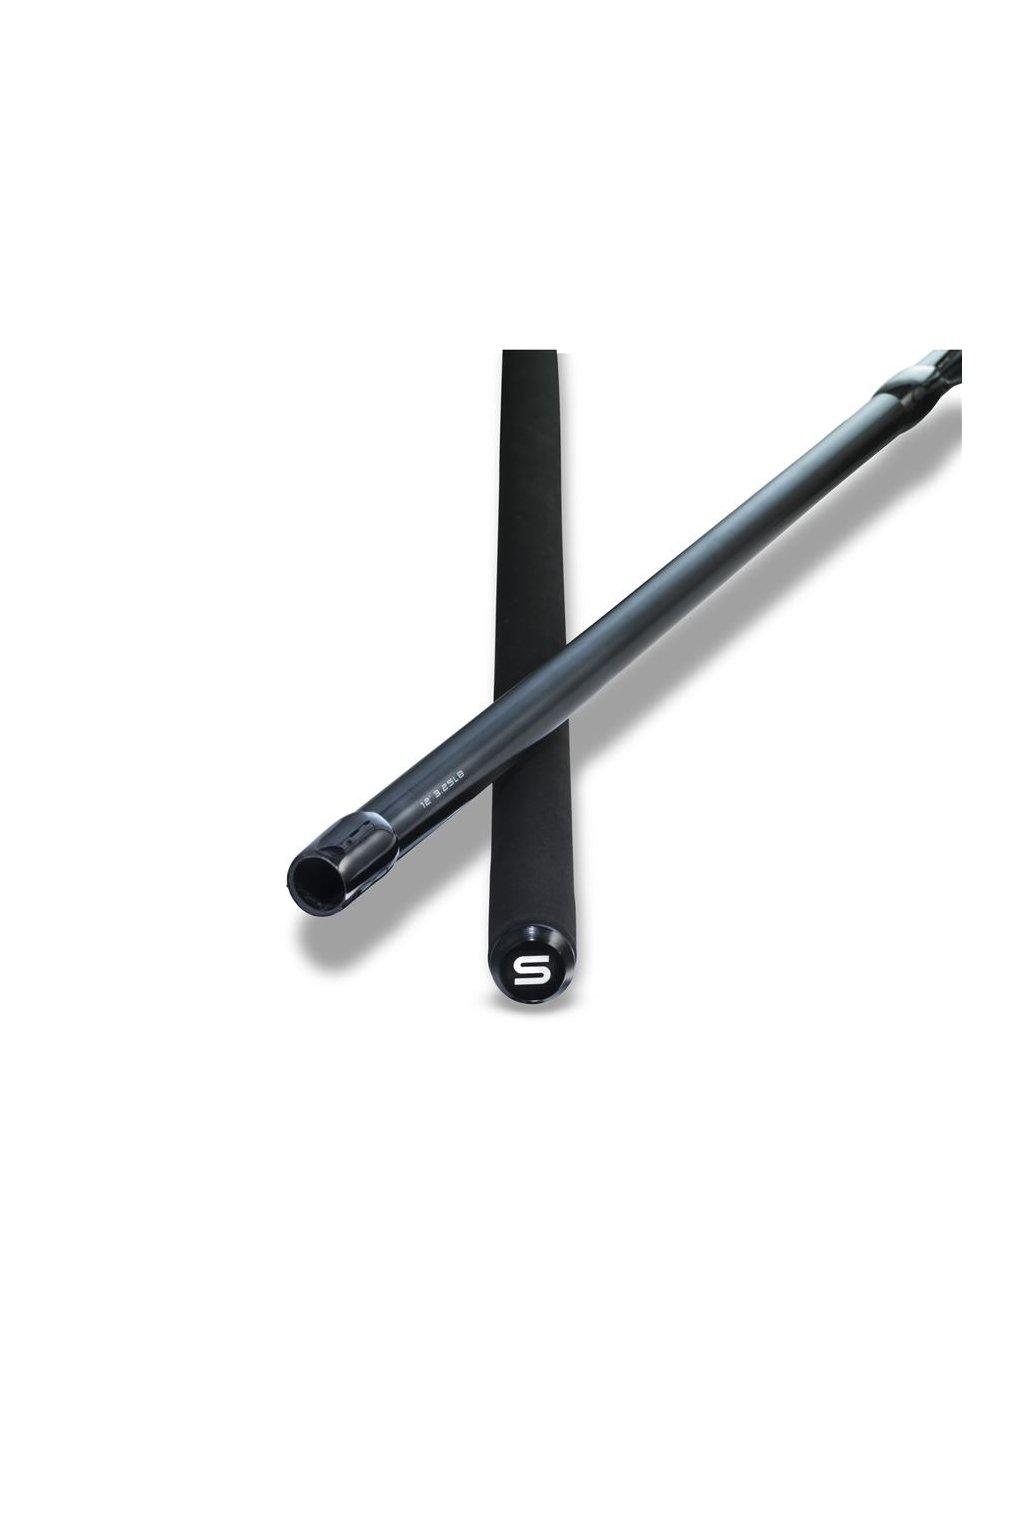 Sonik: Prut Xtractor Recon Carp Rod 8' 2,4m 3lb